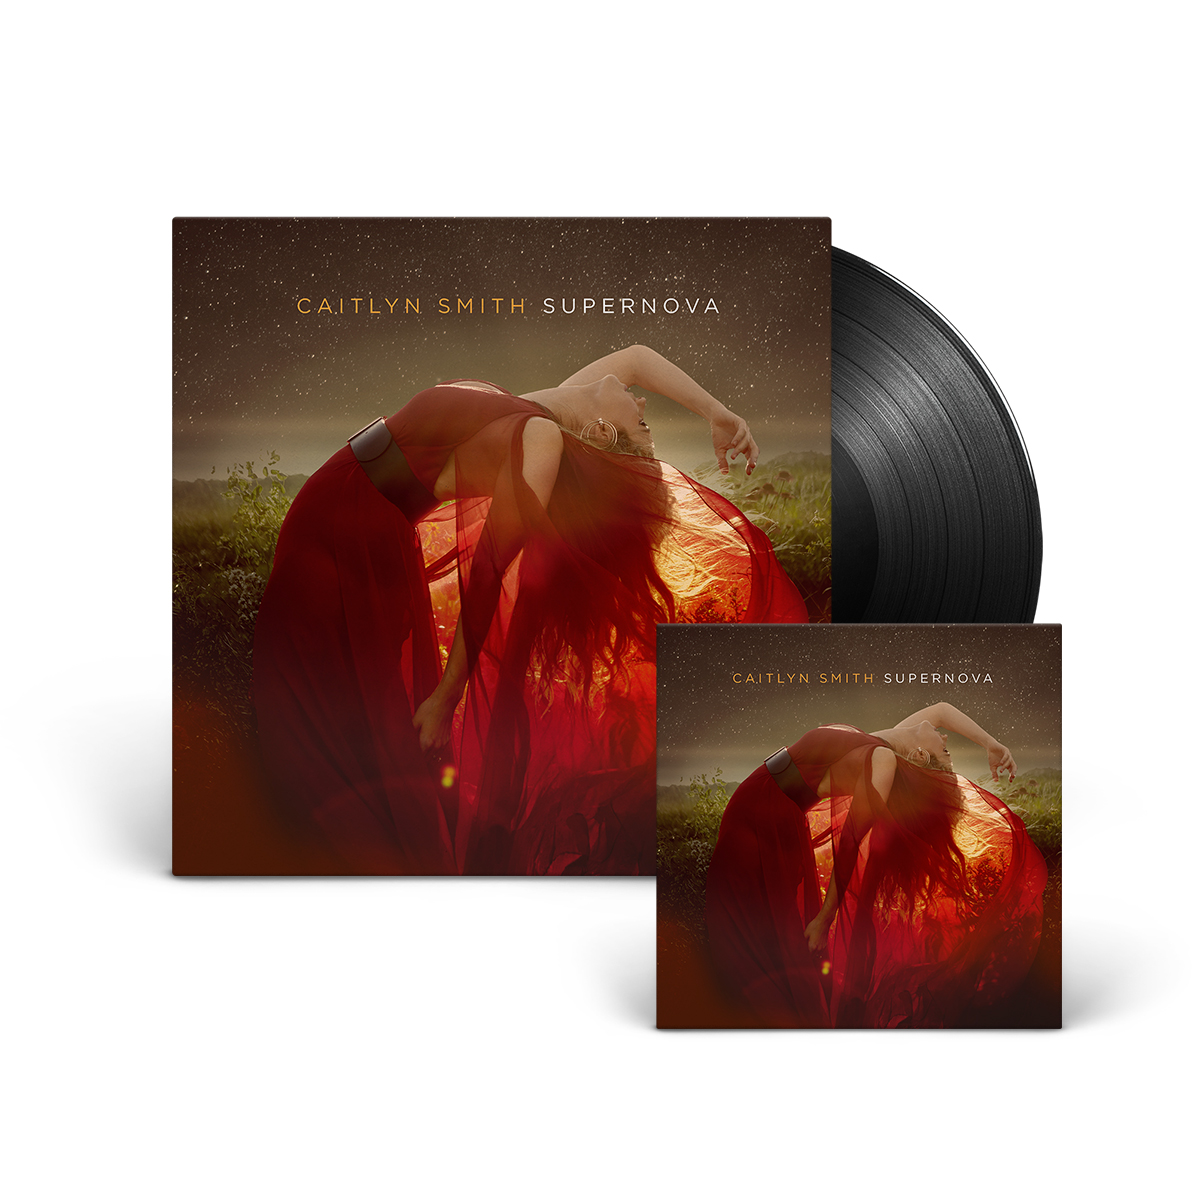 Supernova Vinyl + Digital Album Download